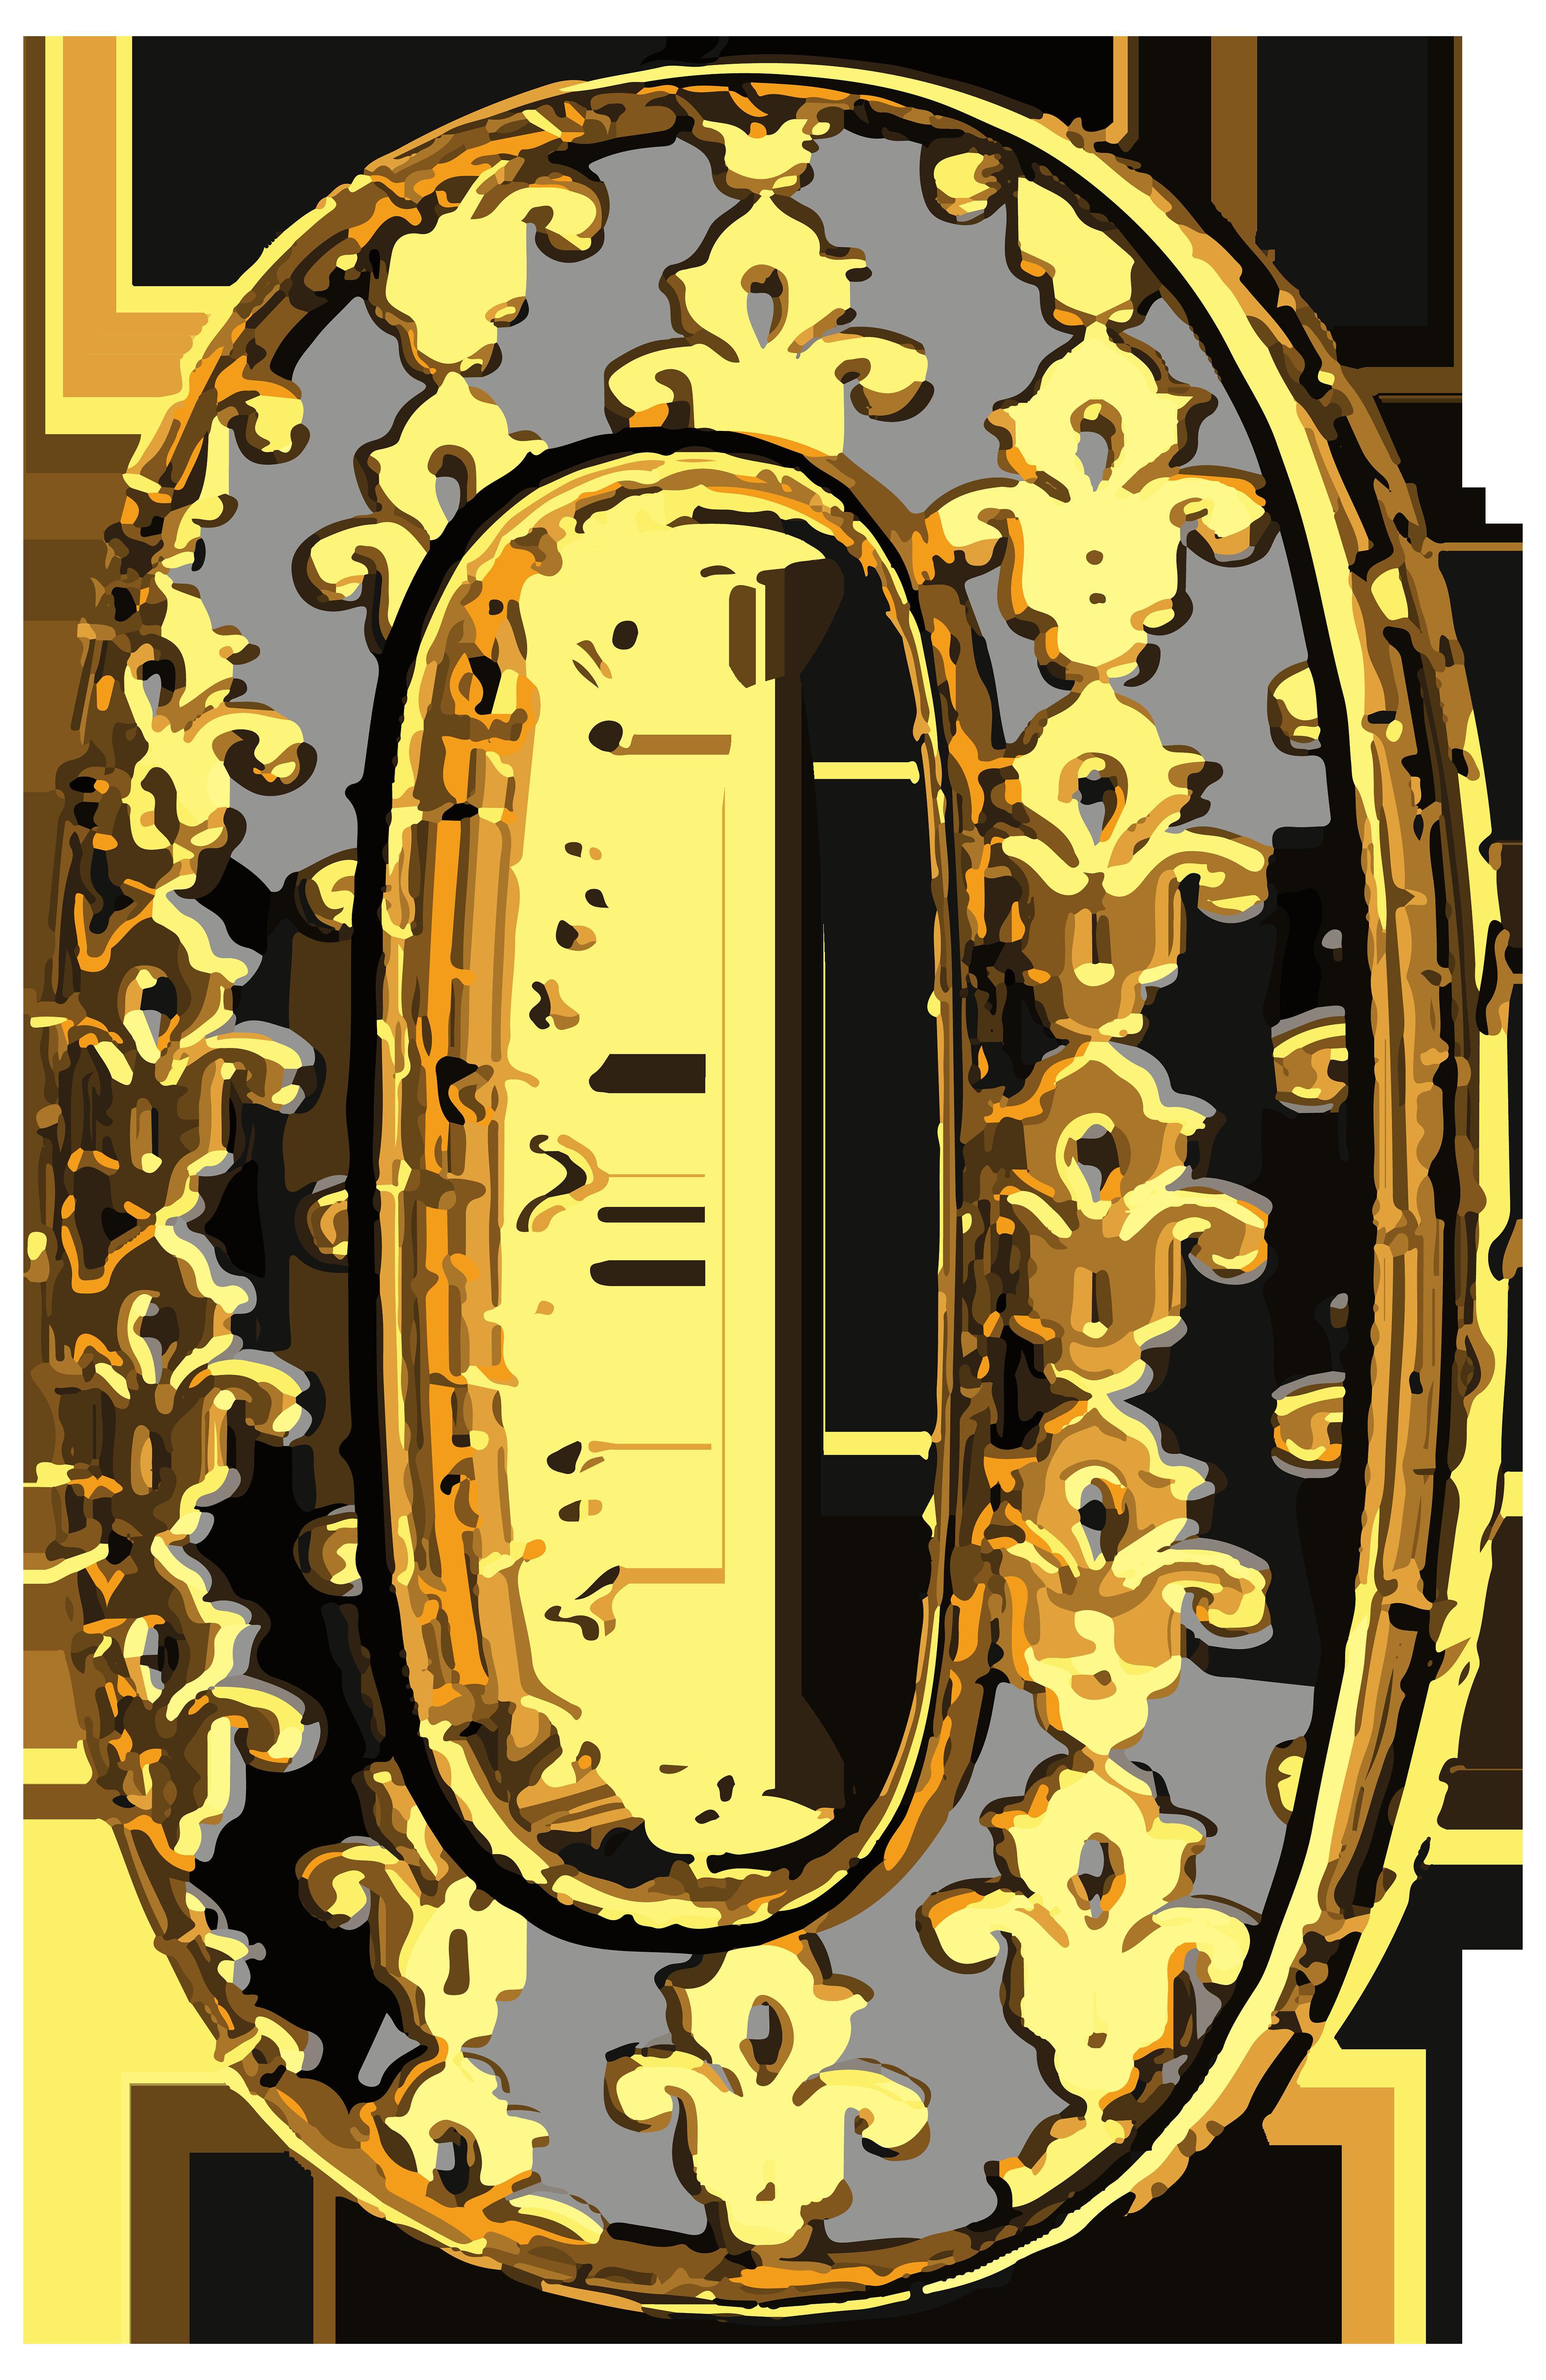 Horseshoe clipart letter. Elegant vintage number zero